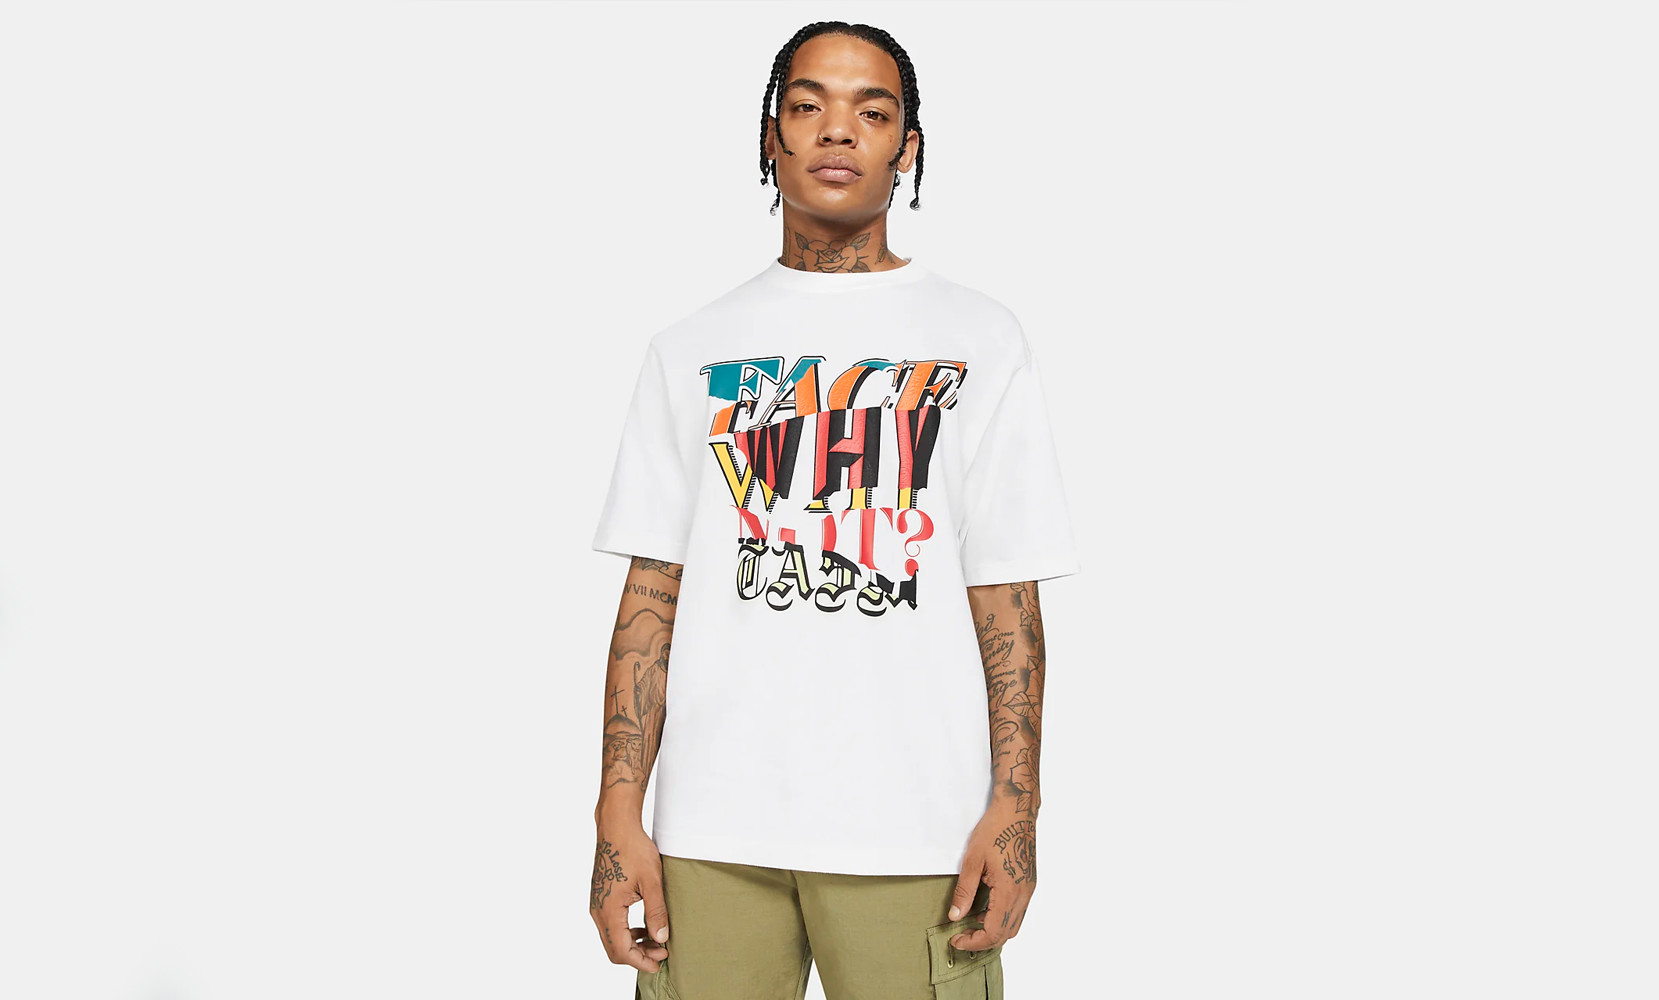 Jordan brand x WhyNot? x Facetasm